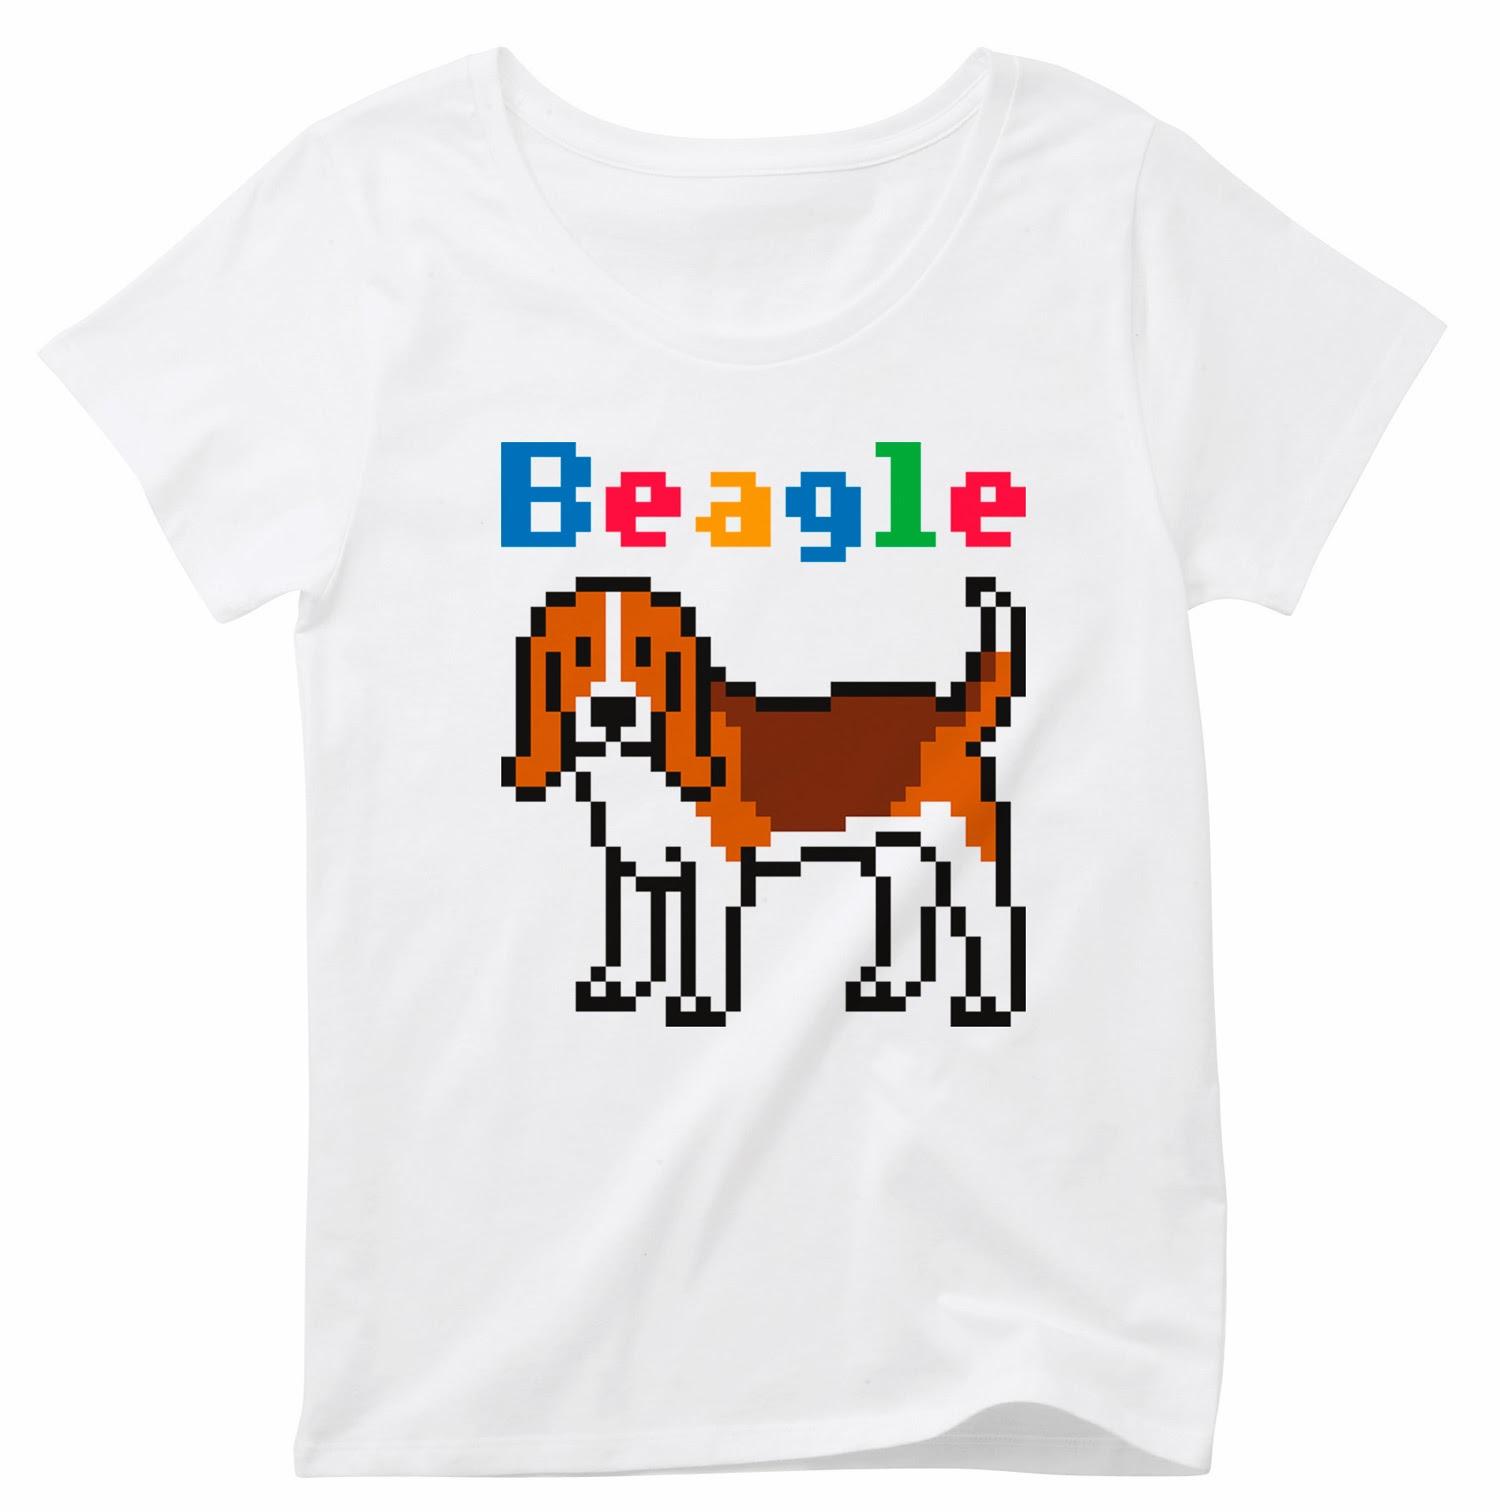 Pixel Party Boy「Beagle犬索」[Girls oval T-shirt] 4.3オンスオバールTシャツ | T-SHIRT COUNCIL